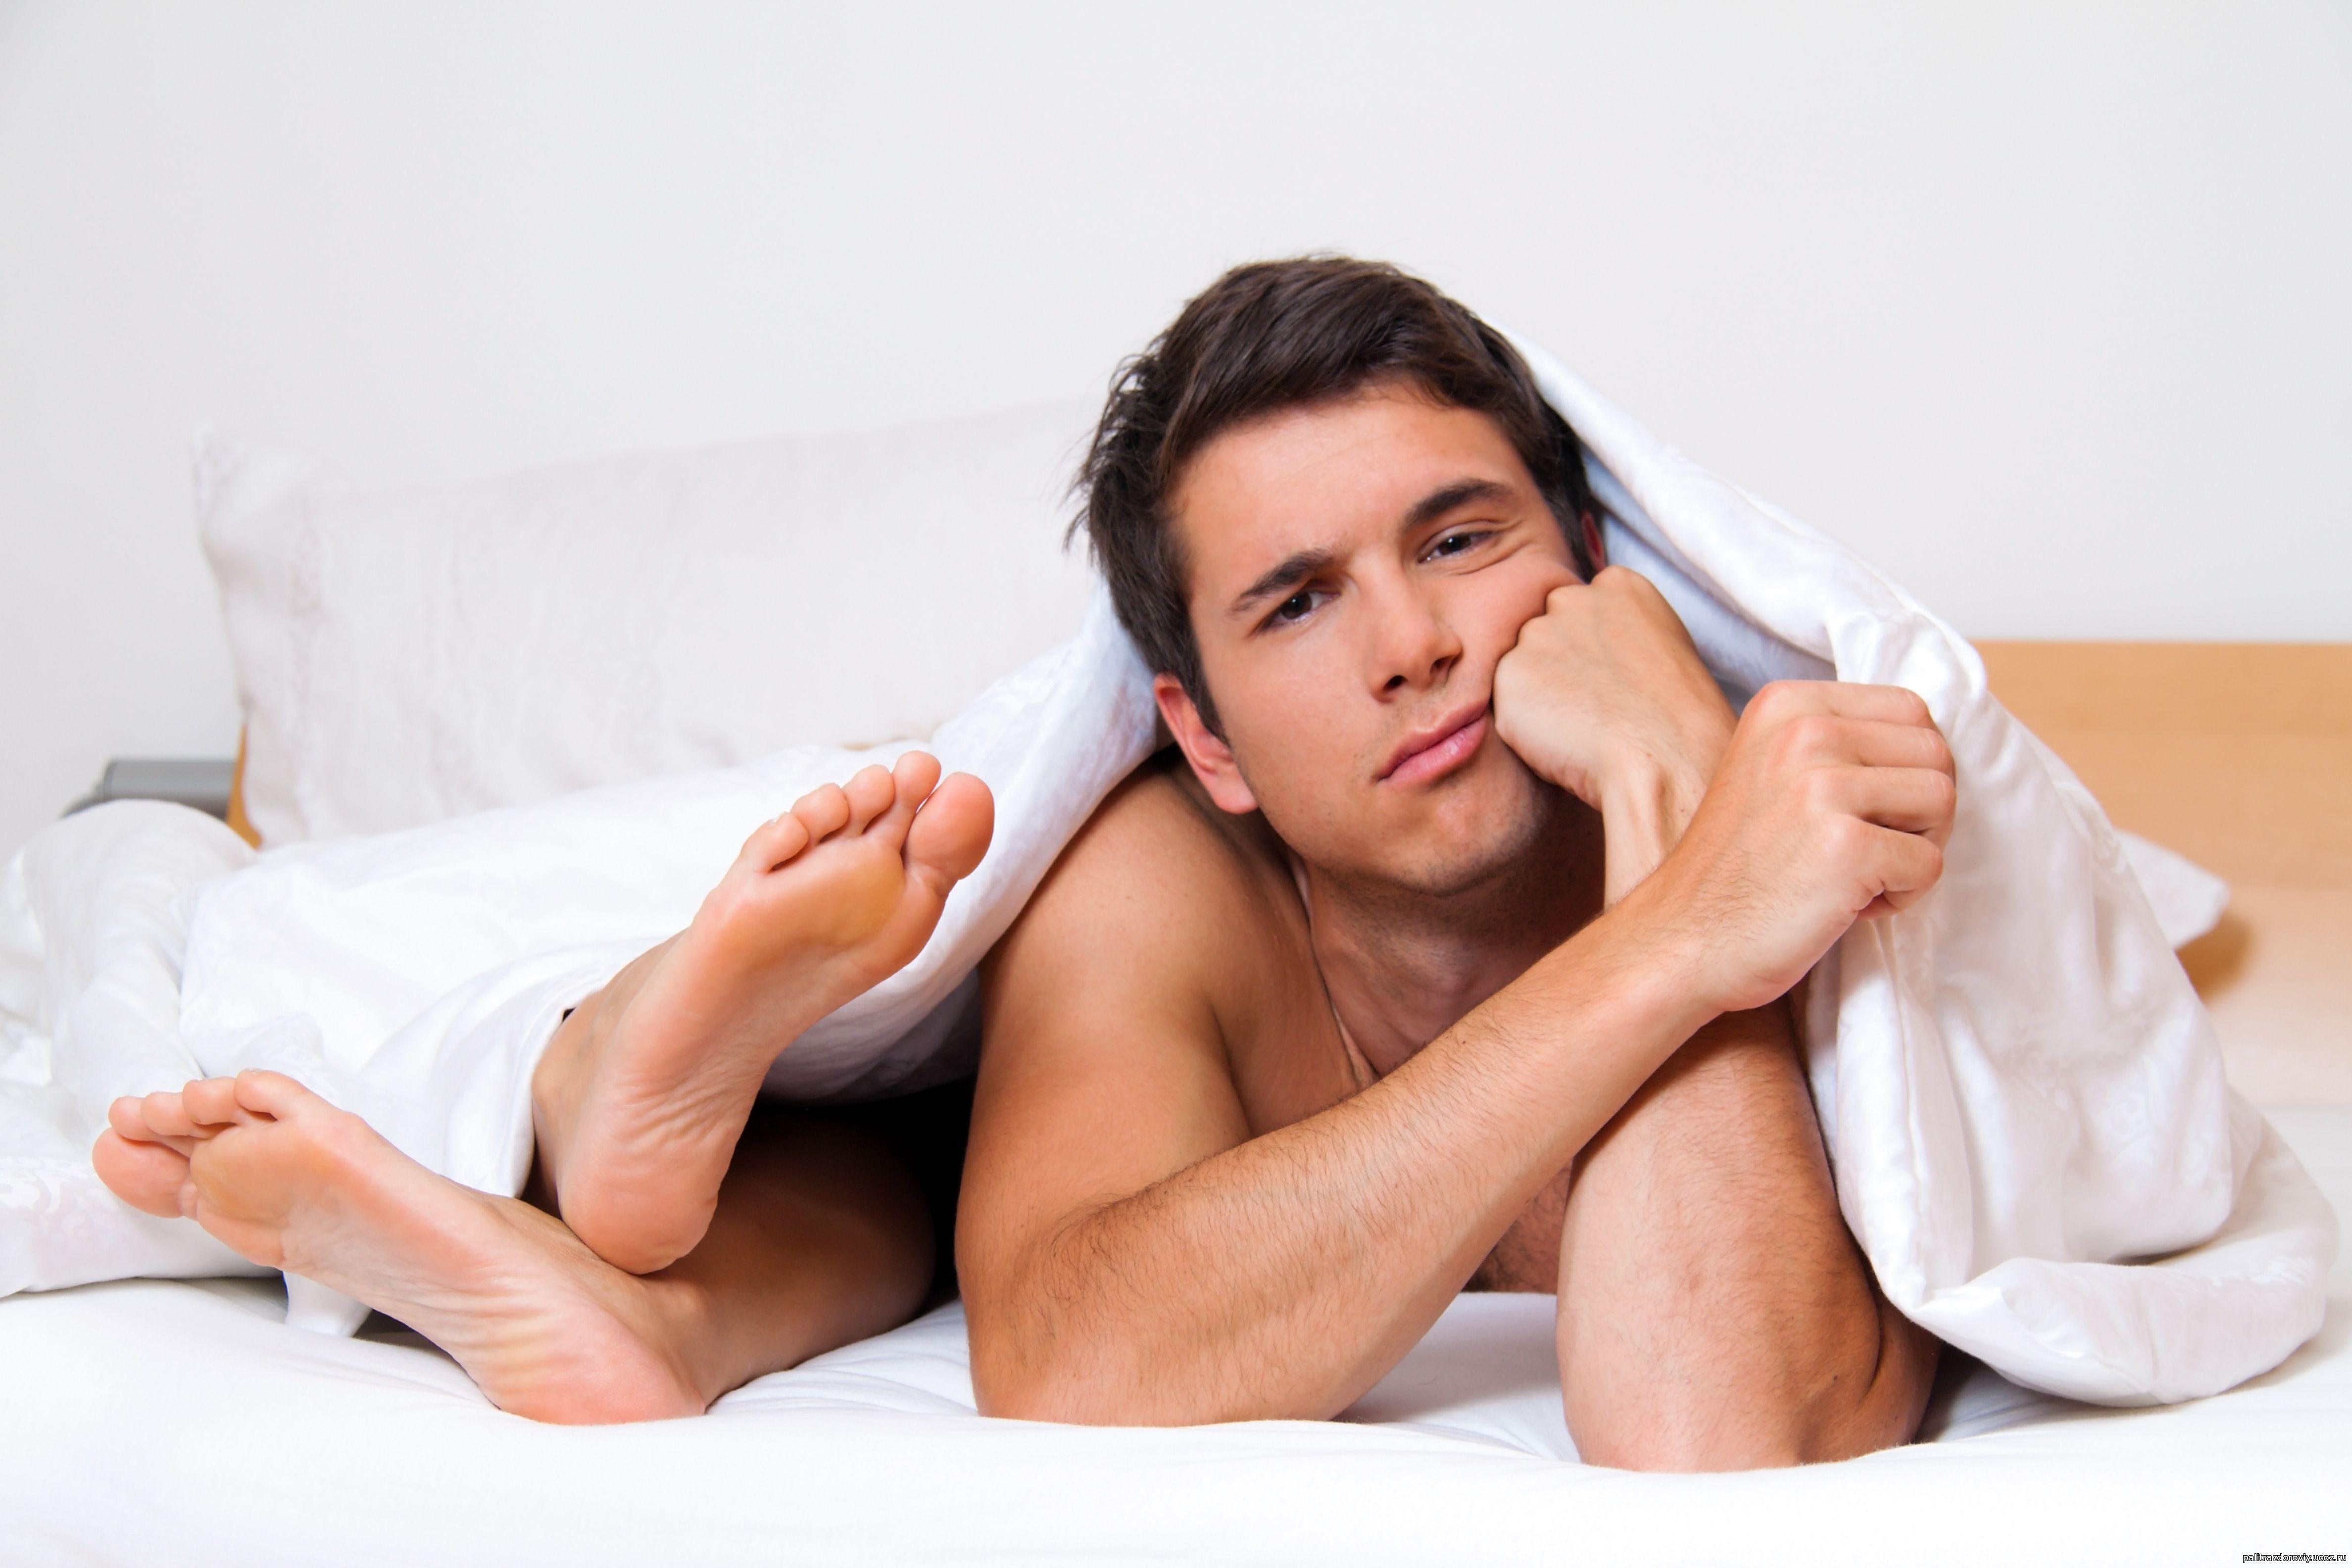 Фото мужчины в сексе 16 фотография